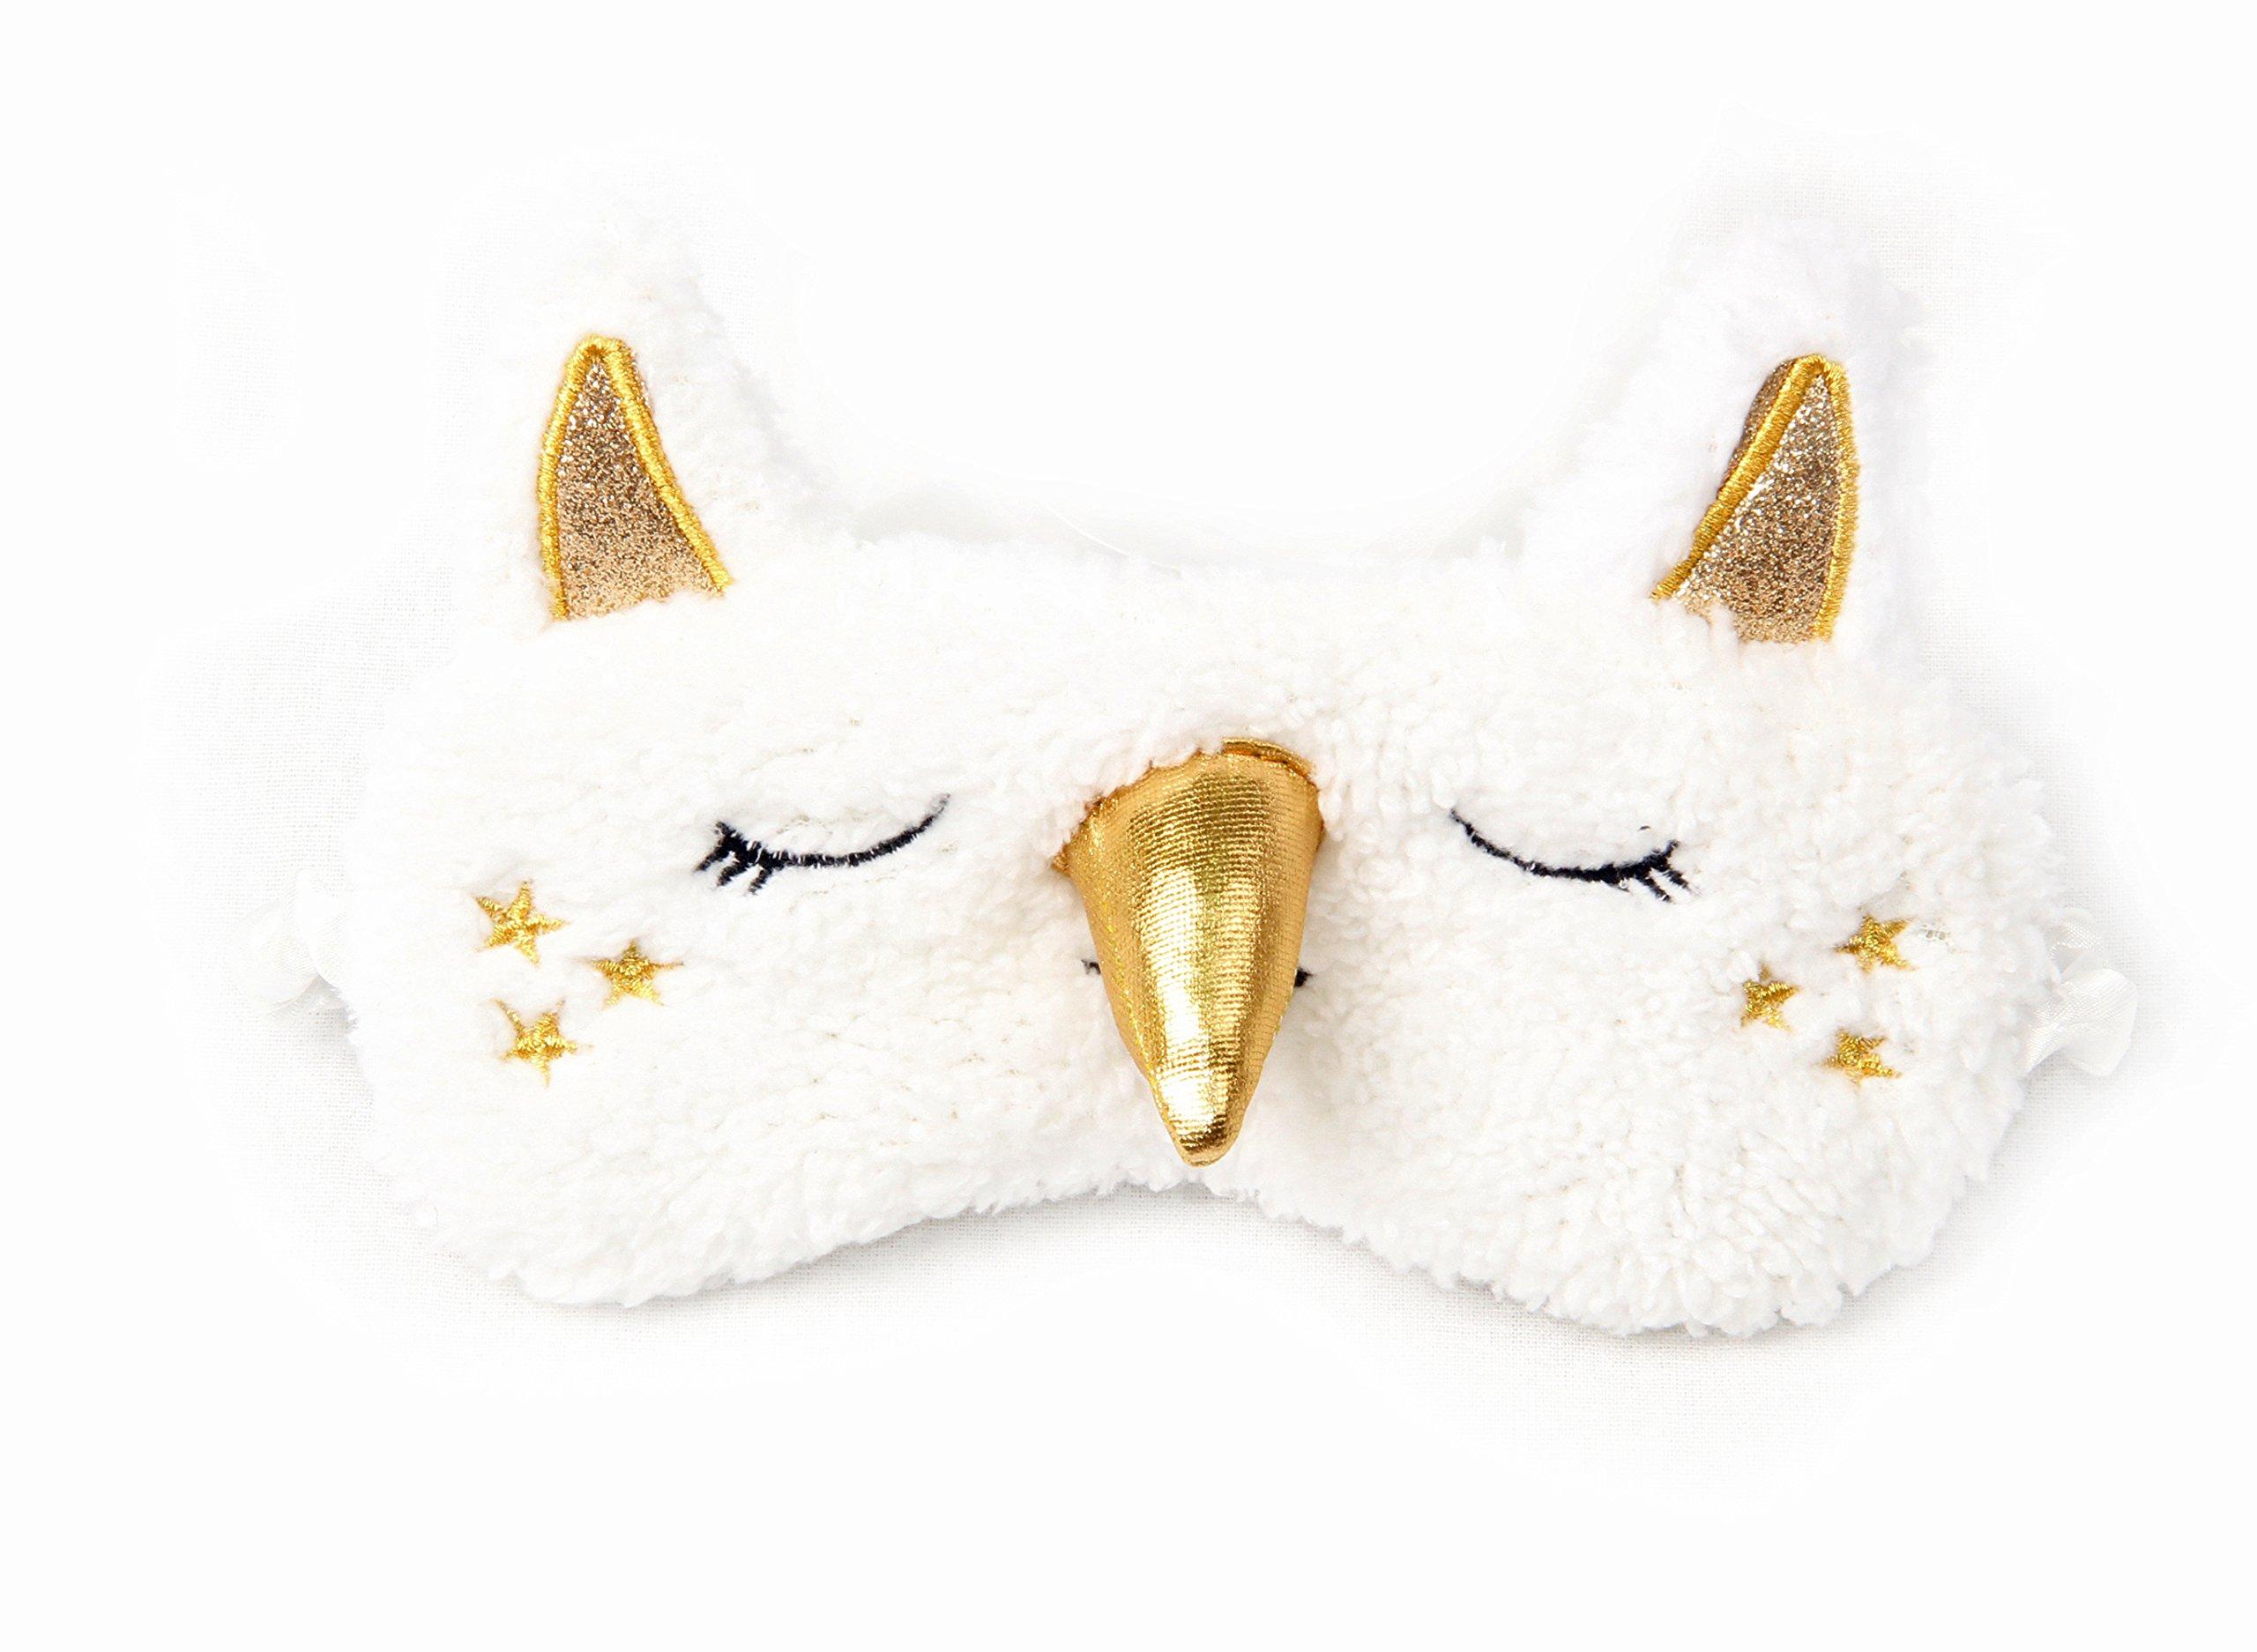 3 Pack Unicorn Sleep Mask Cute Unicorn Horn Soft Plush Blindfold Eye Cover Eyeshade for Teens Girls Women Plane Travel Nap Night Sleeping by OurSuperDeals (Image #2)